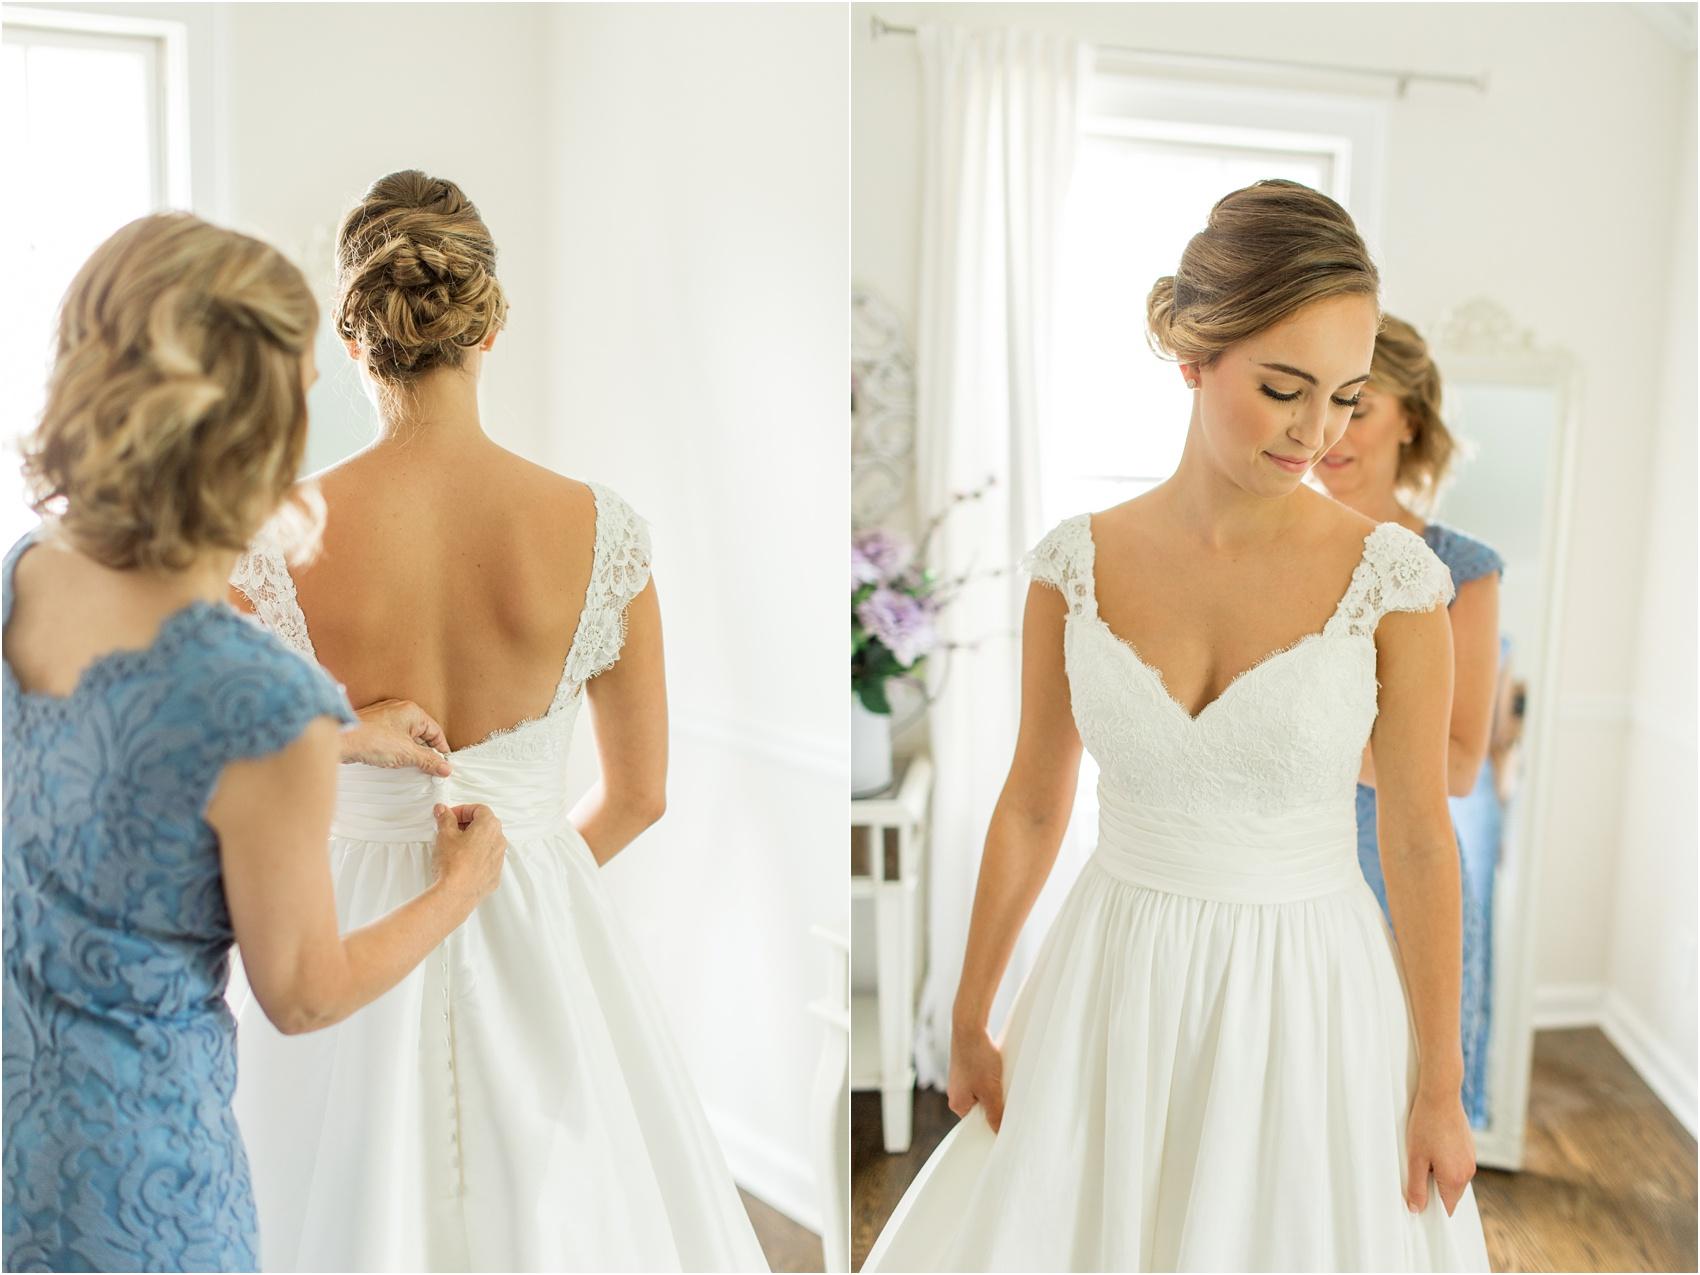 Savannah Eve Photography- Sigl-Adams Wedding- Sneak Peek-8.jpg